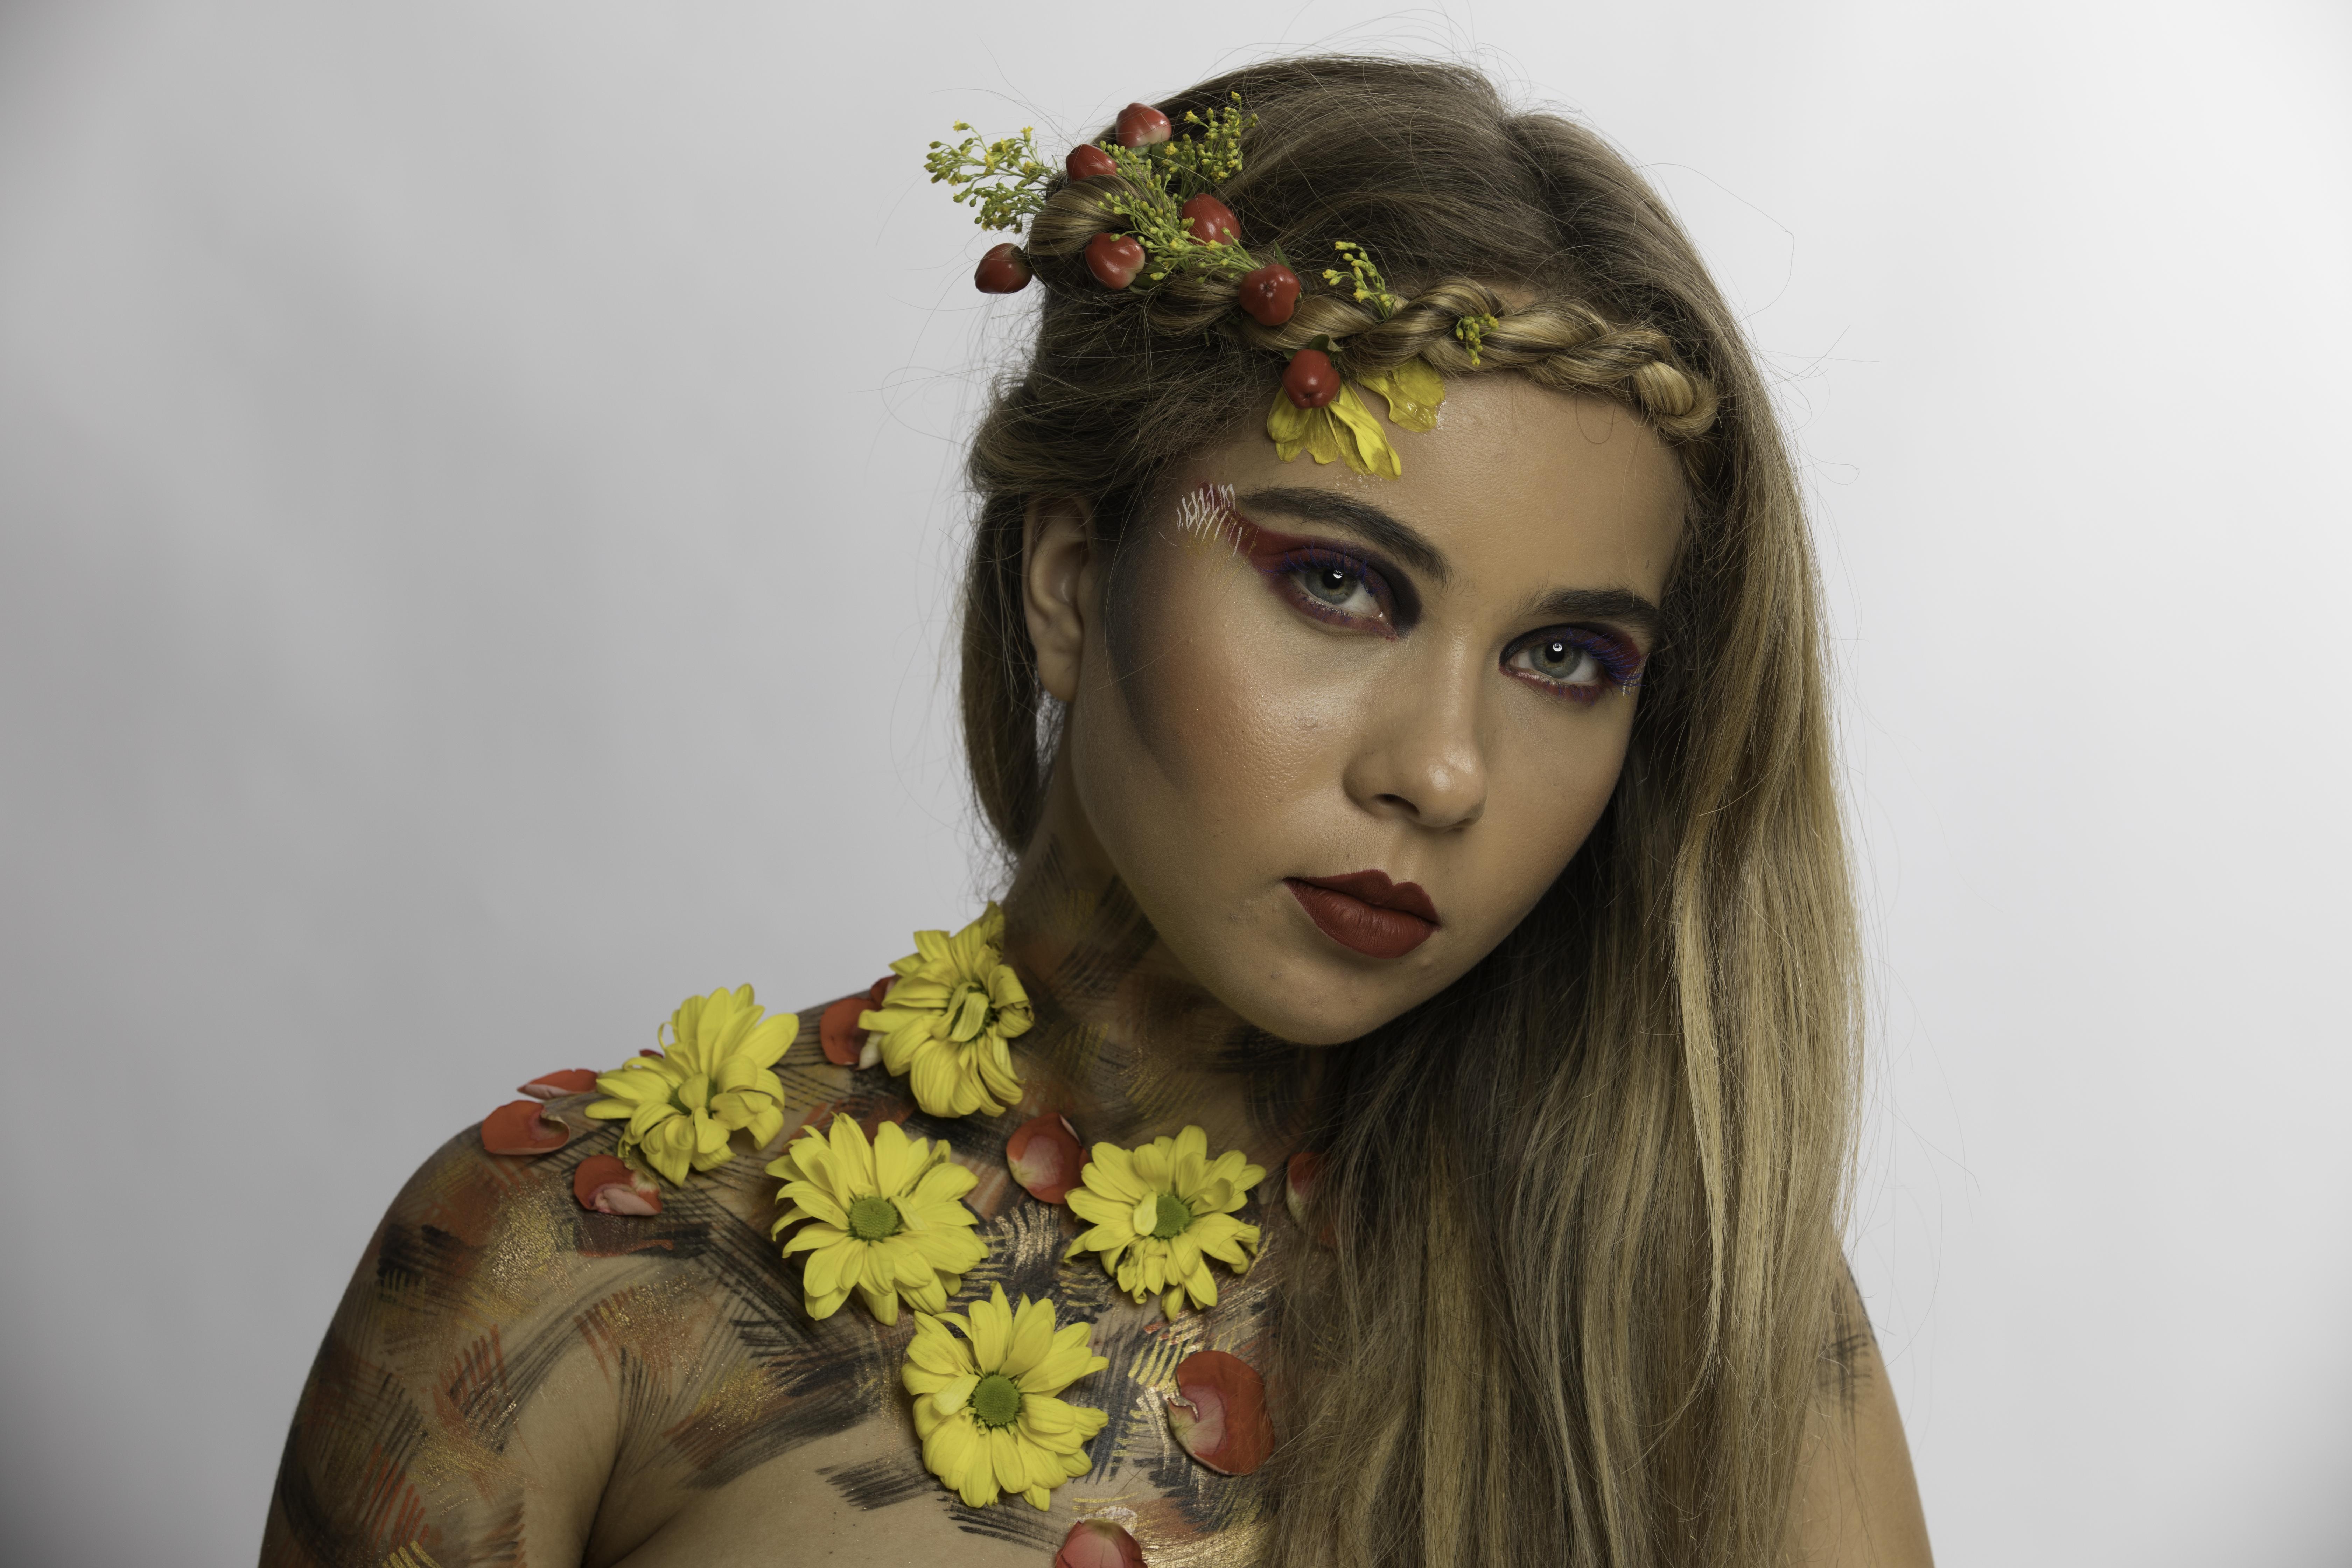 21072019-Studio - Maquillage Floral 570.